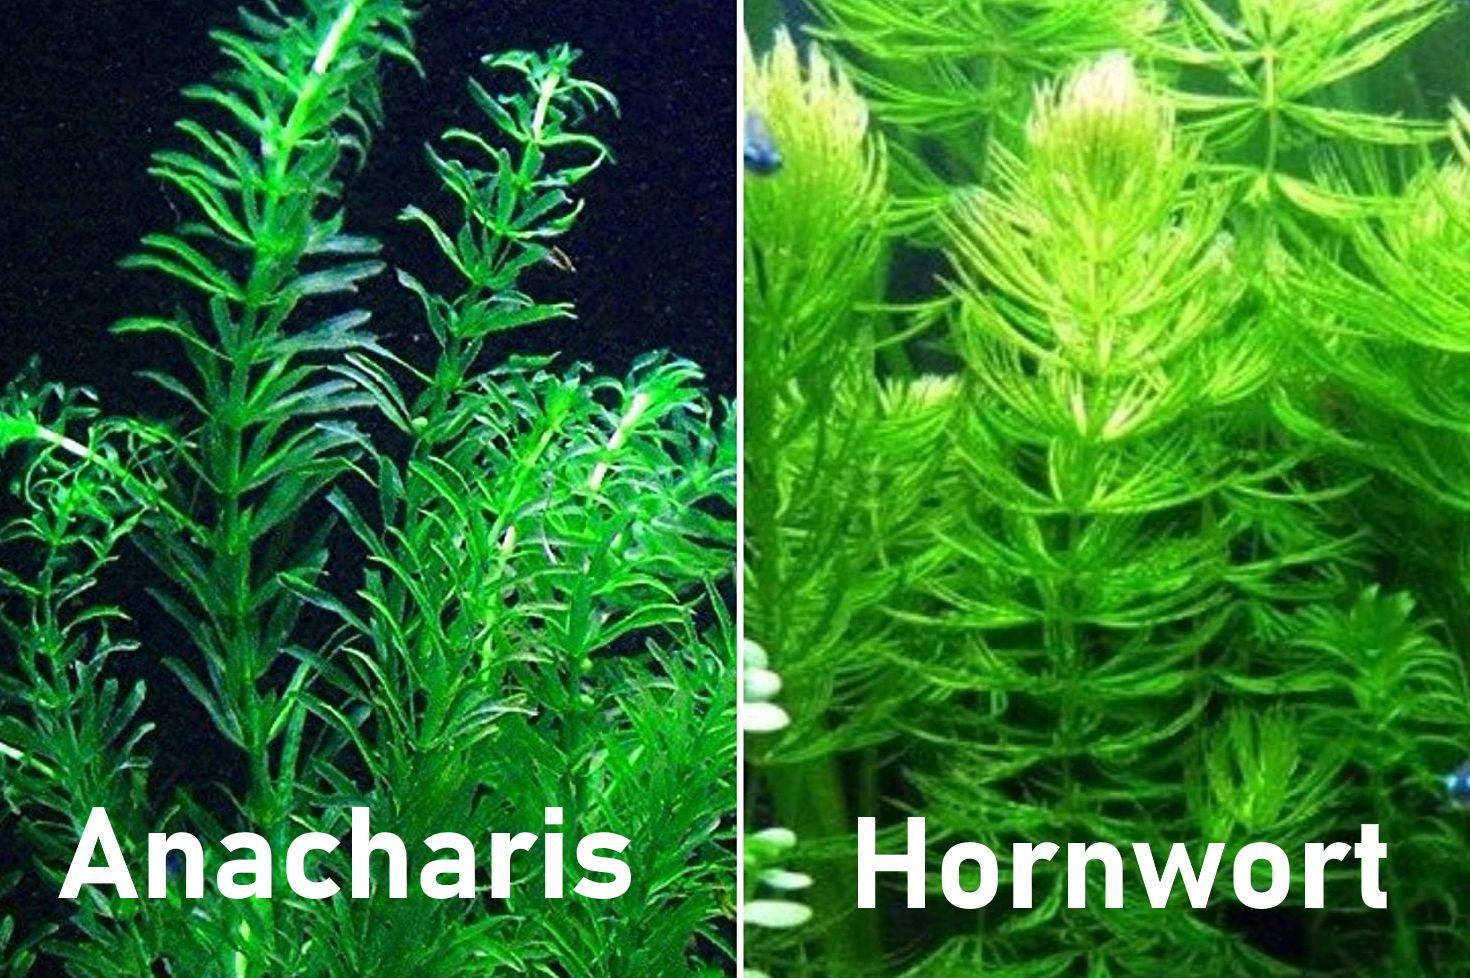 pond plants Anacharis and Hornwort bundle